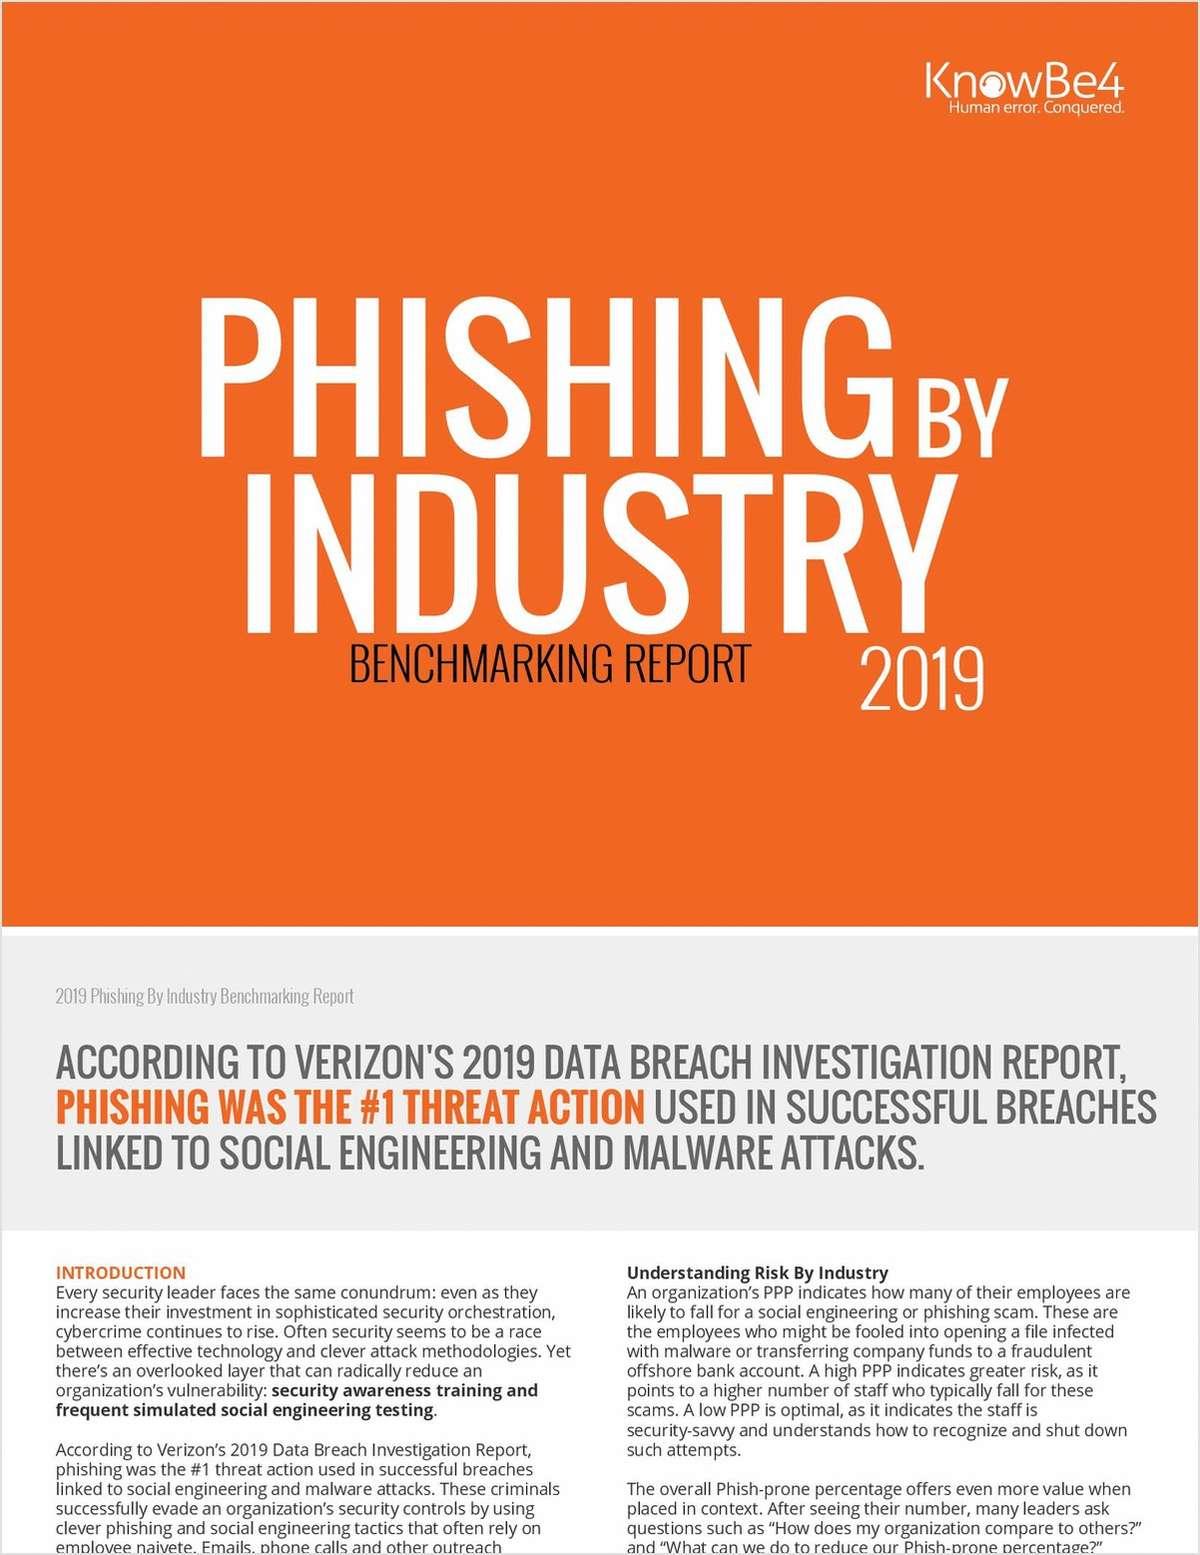 The 2019 Phishing Industry Benchmarking Report